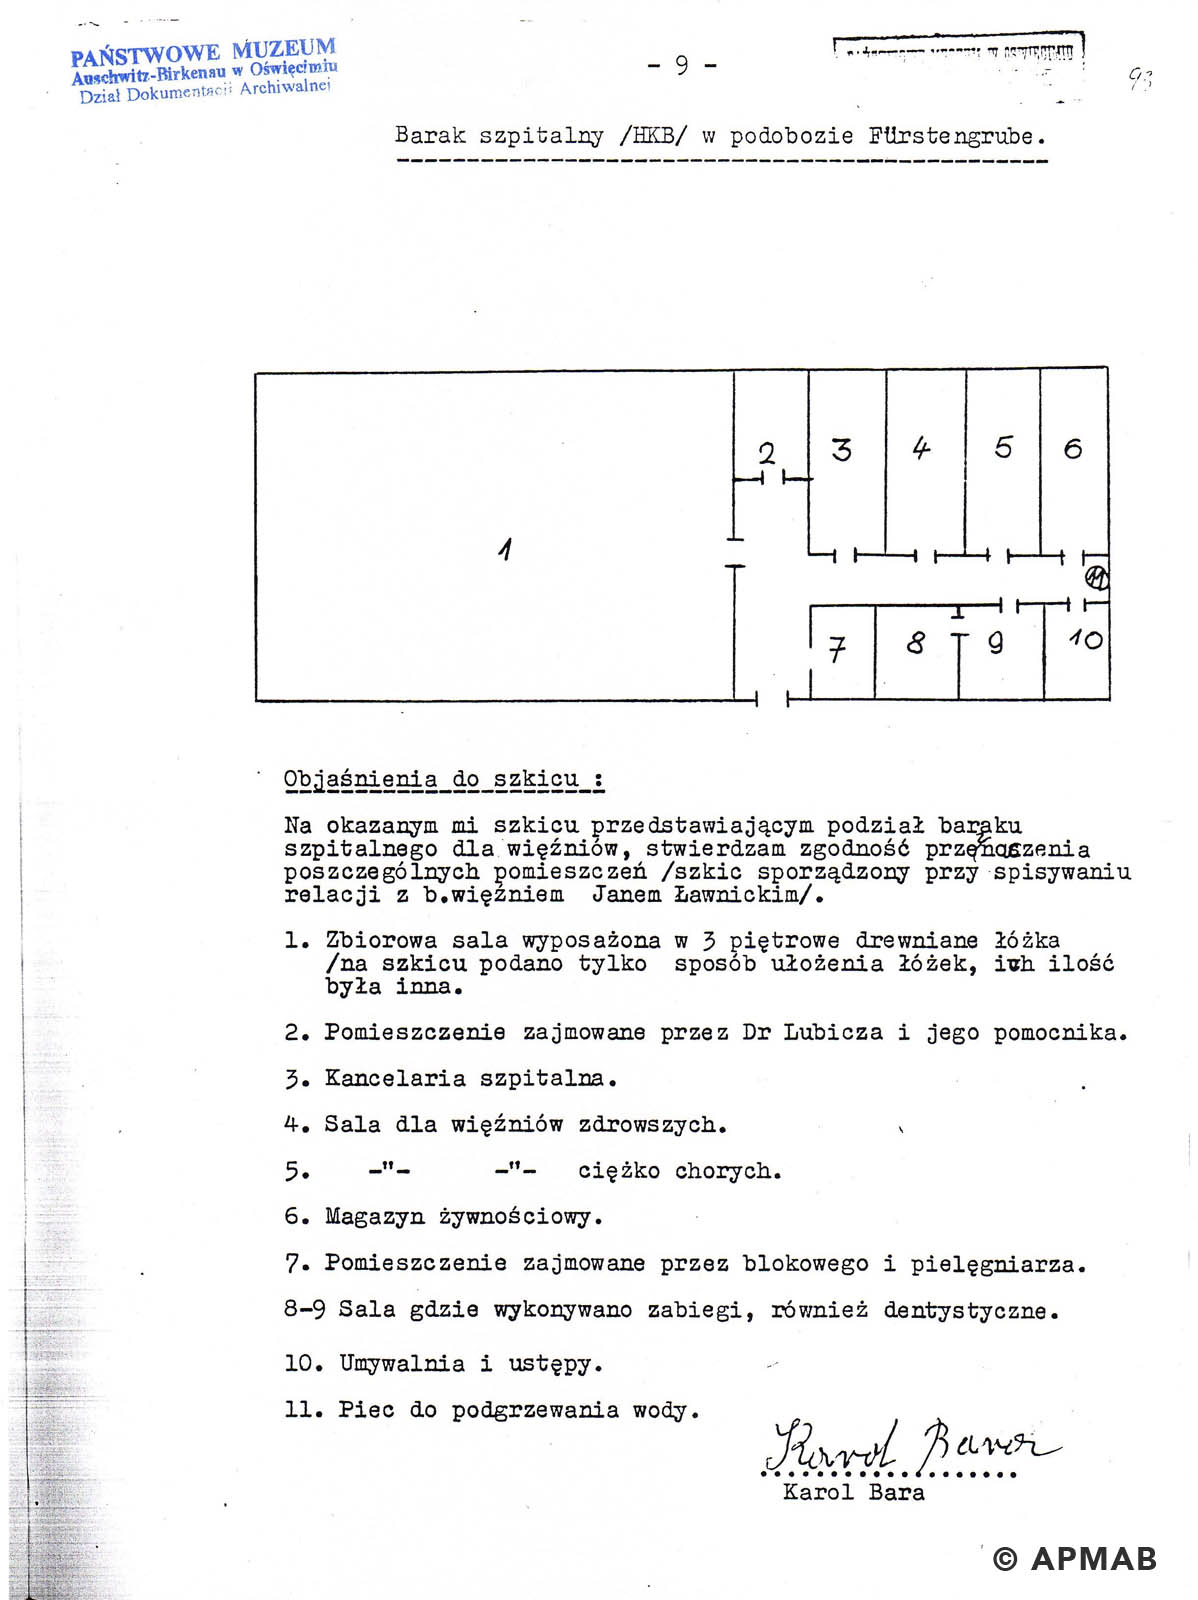 Former prisoner drawing of Fürstengrube sub camp hospital barracks. APMAB